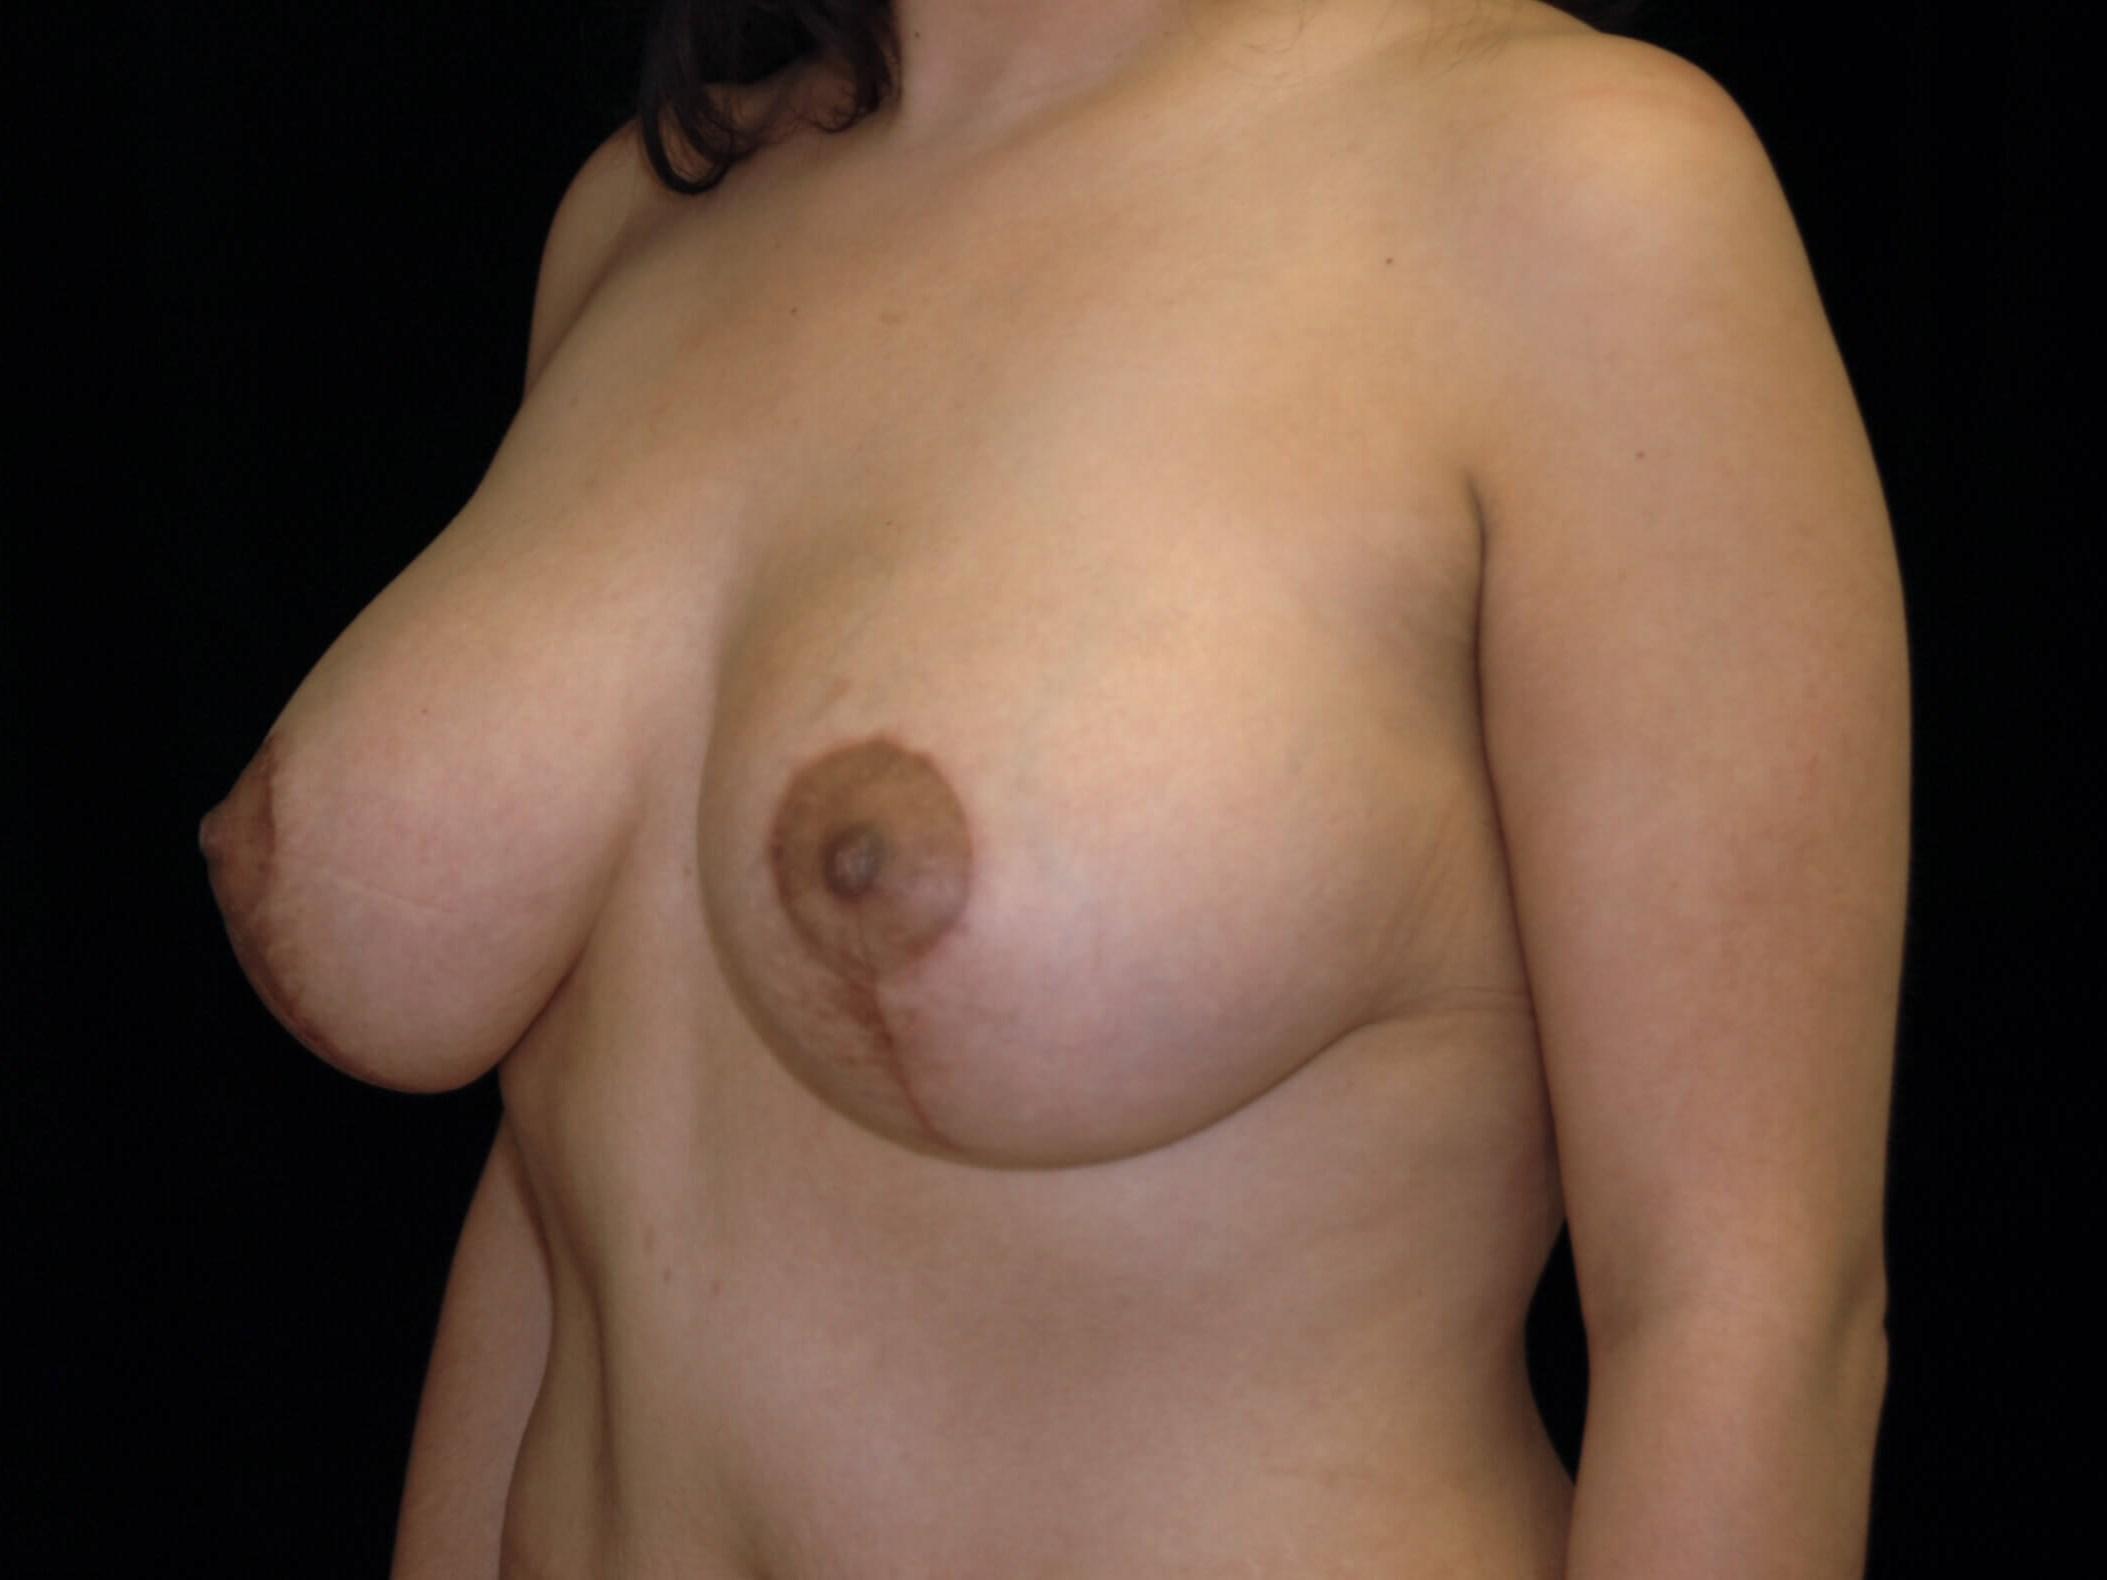 DALLAS, TEXAS WOMAN HAS BREAST LIFT AND BREAST AUGMENTATION